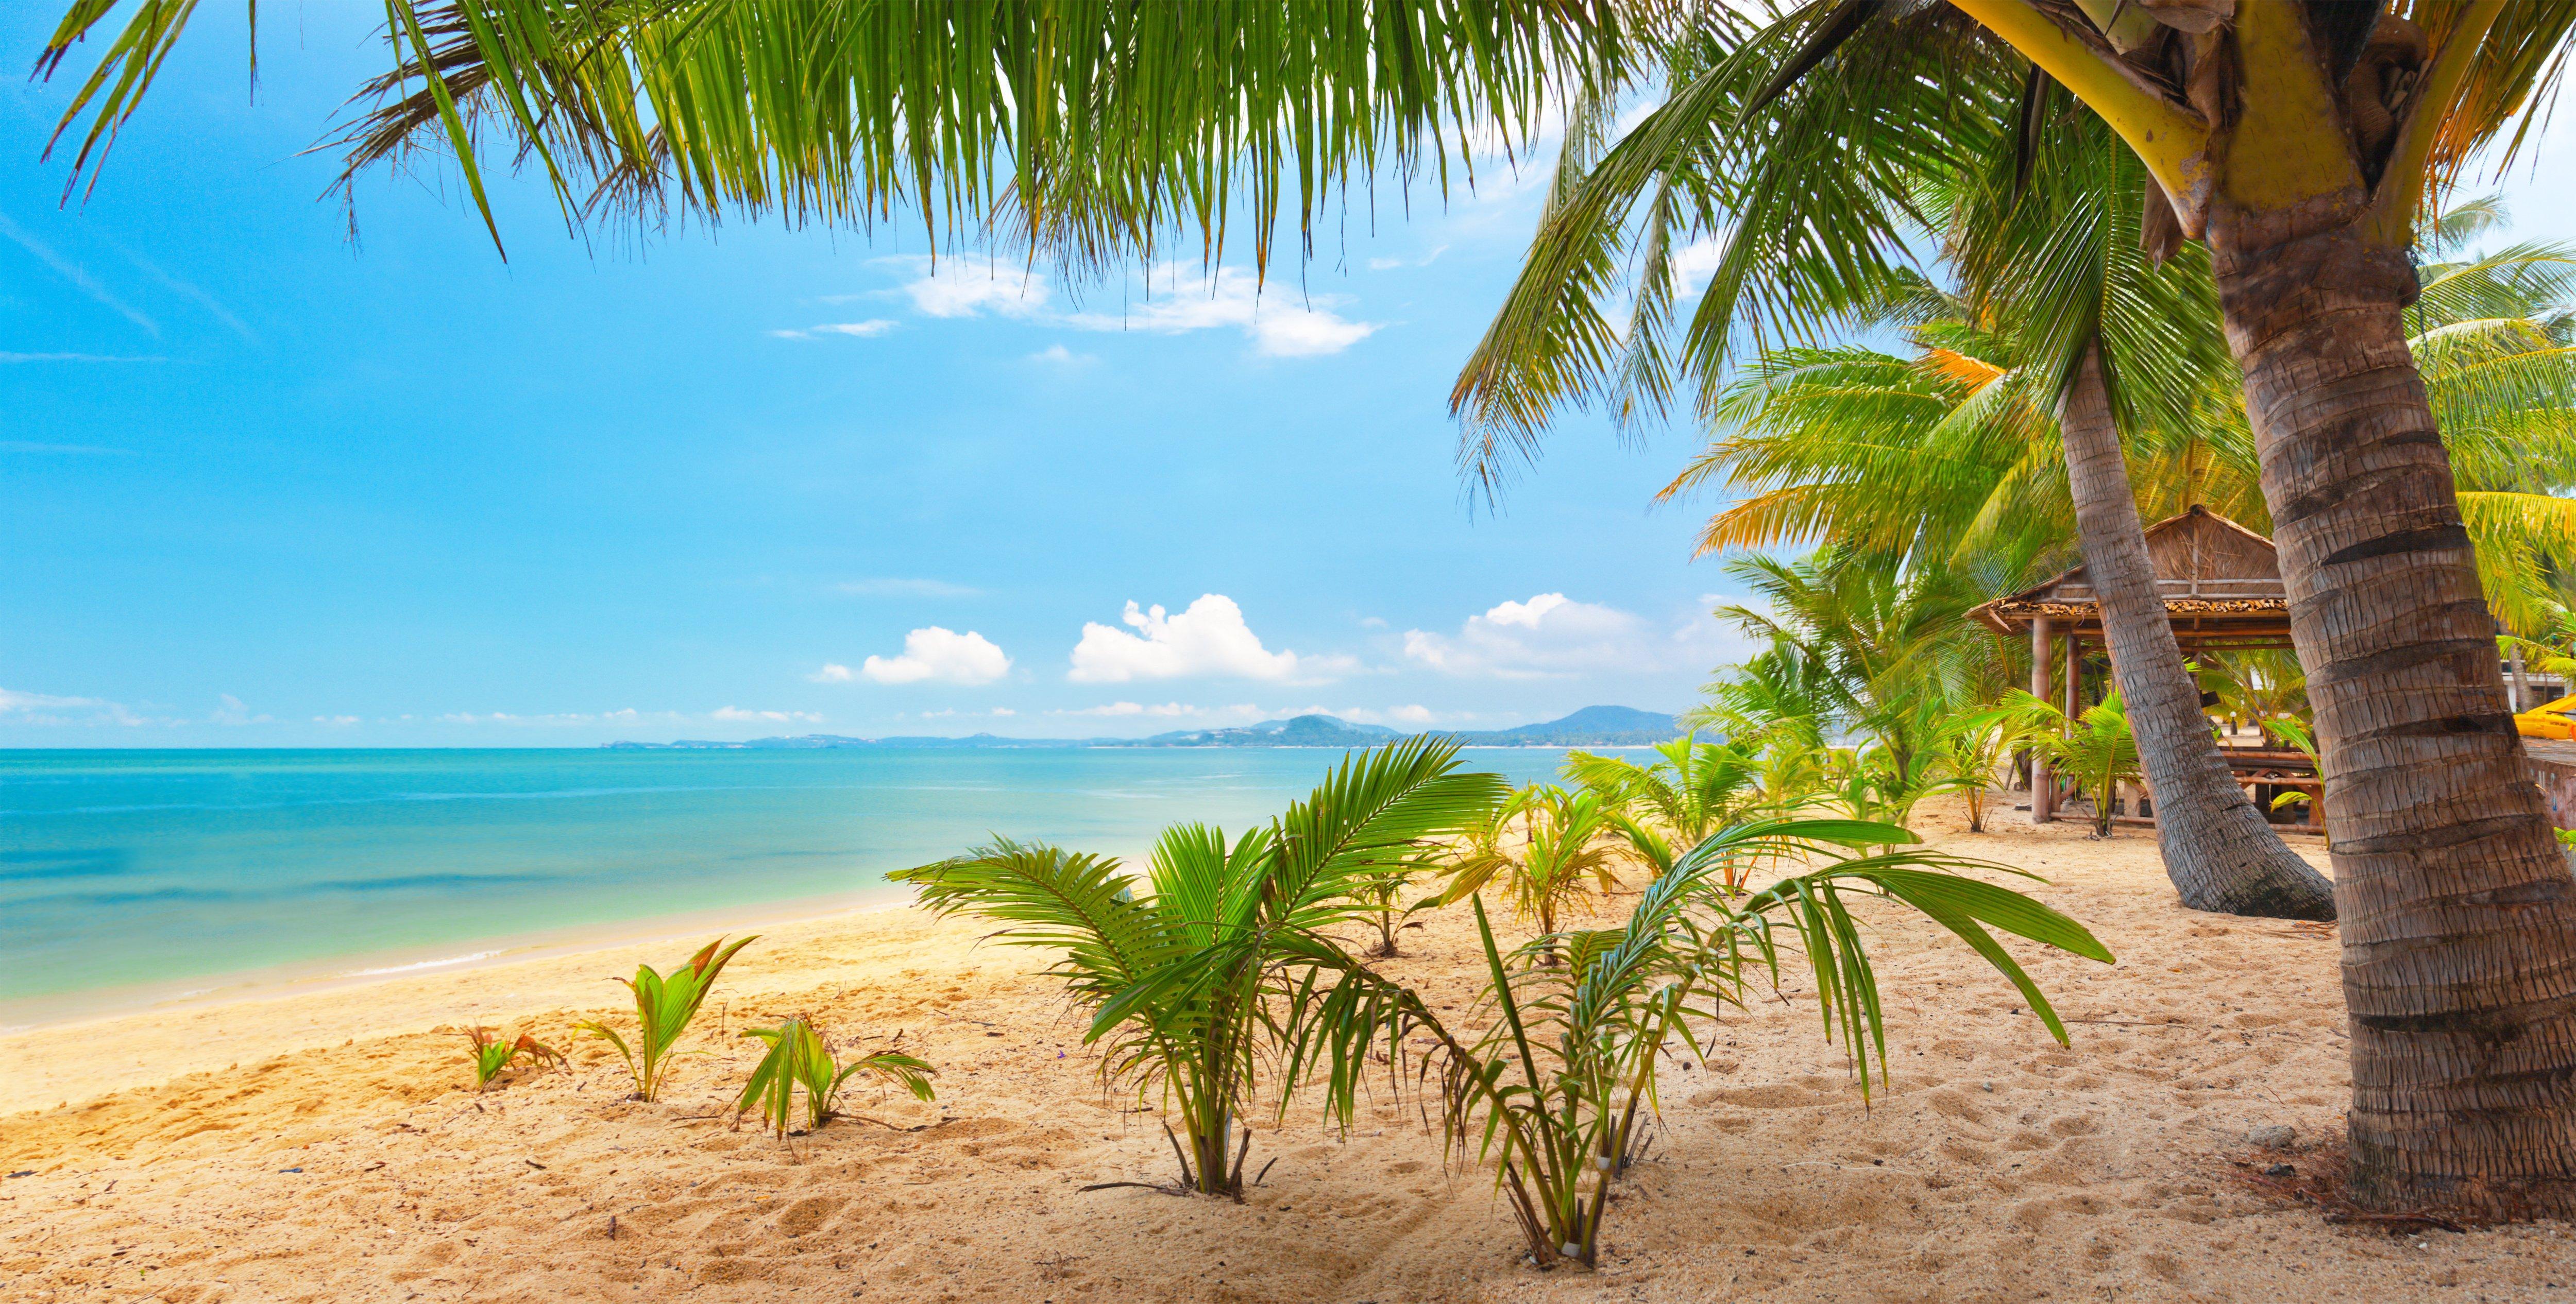 Sand sea sky palm trees nature tropical landscape beautiful wallpaper 5000x2532